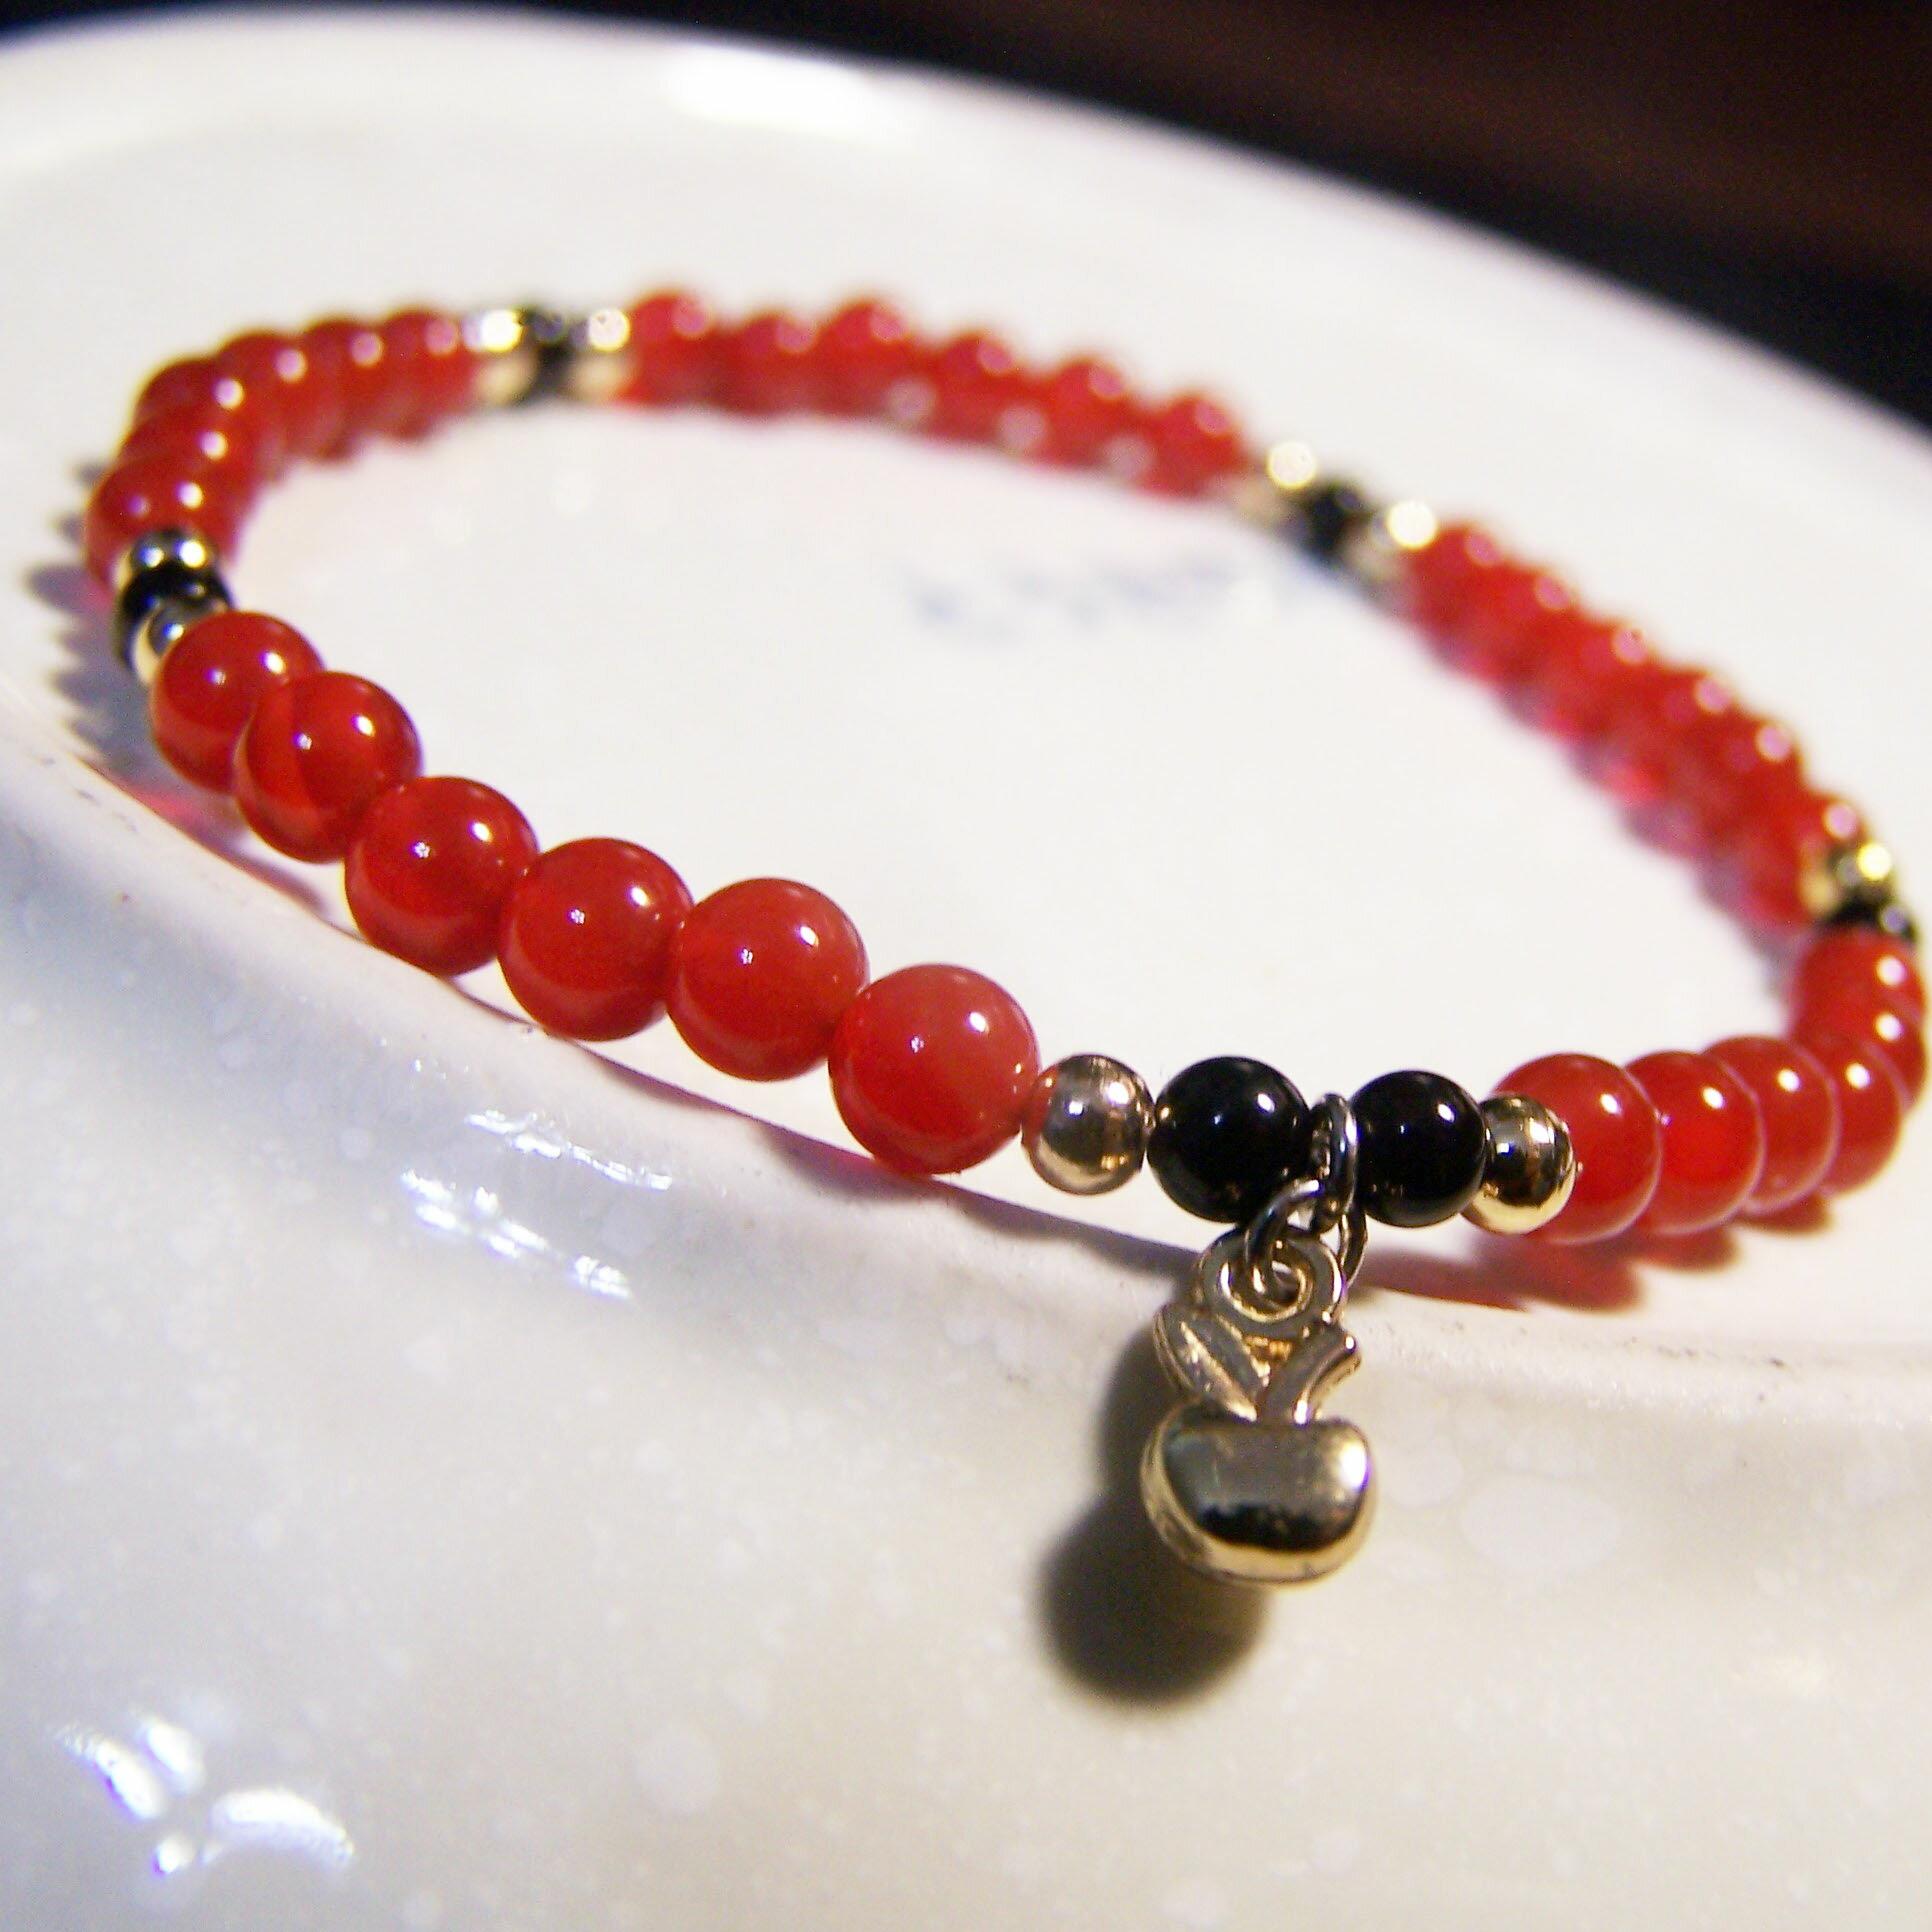 be young【比漾】Mini 秀麗手環 (紅+黑瑪瑙) 單圈手鏈 3